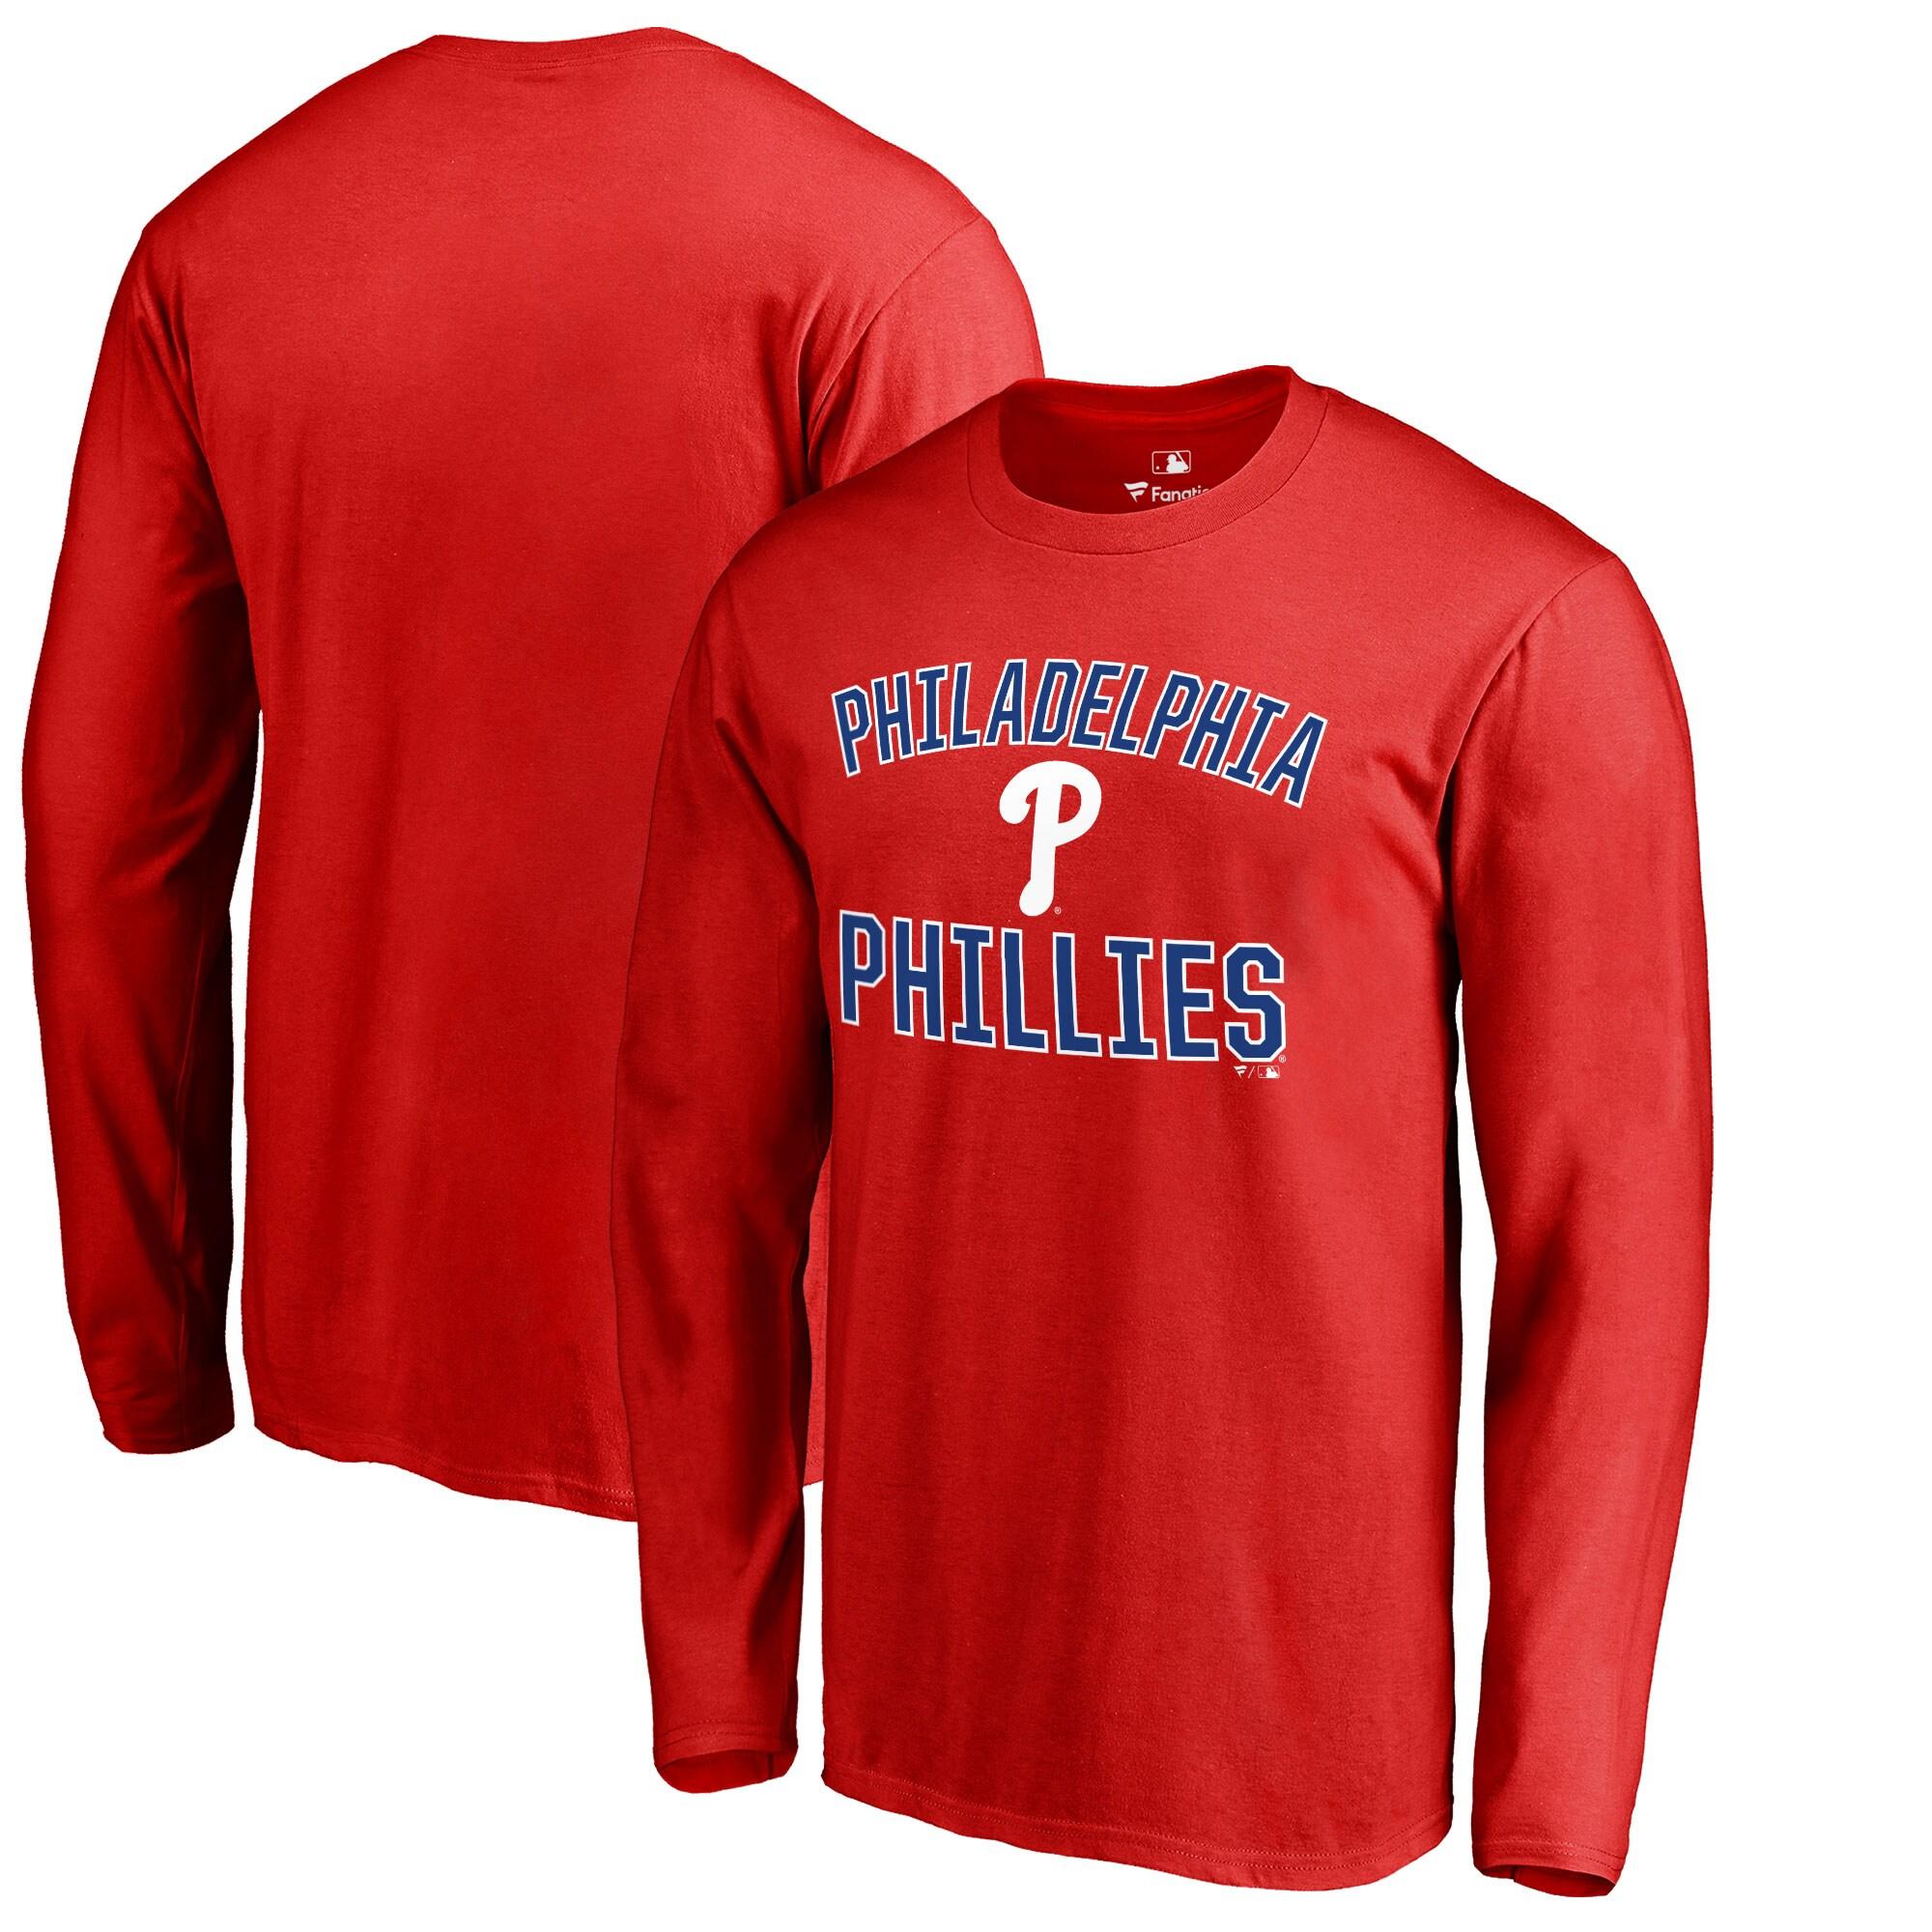 Philadelphia Phillies Victory Arch Big & Tall Long Sleeve T-Shirt - Red